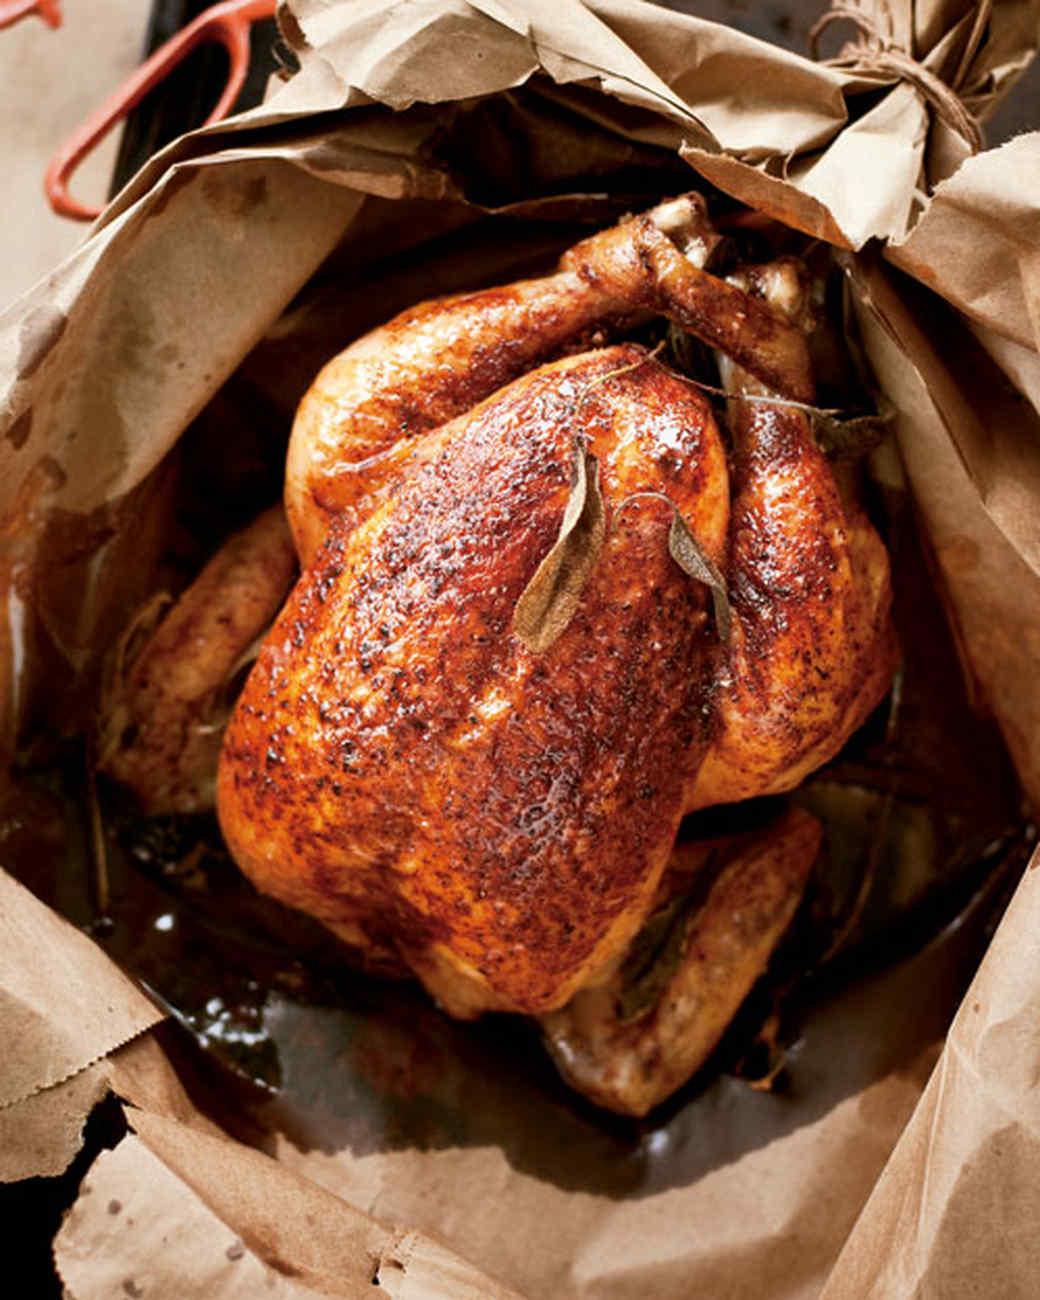 6131_040911_brown_bag_chicken.jpg